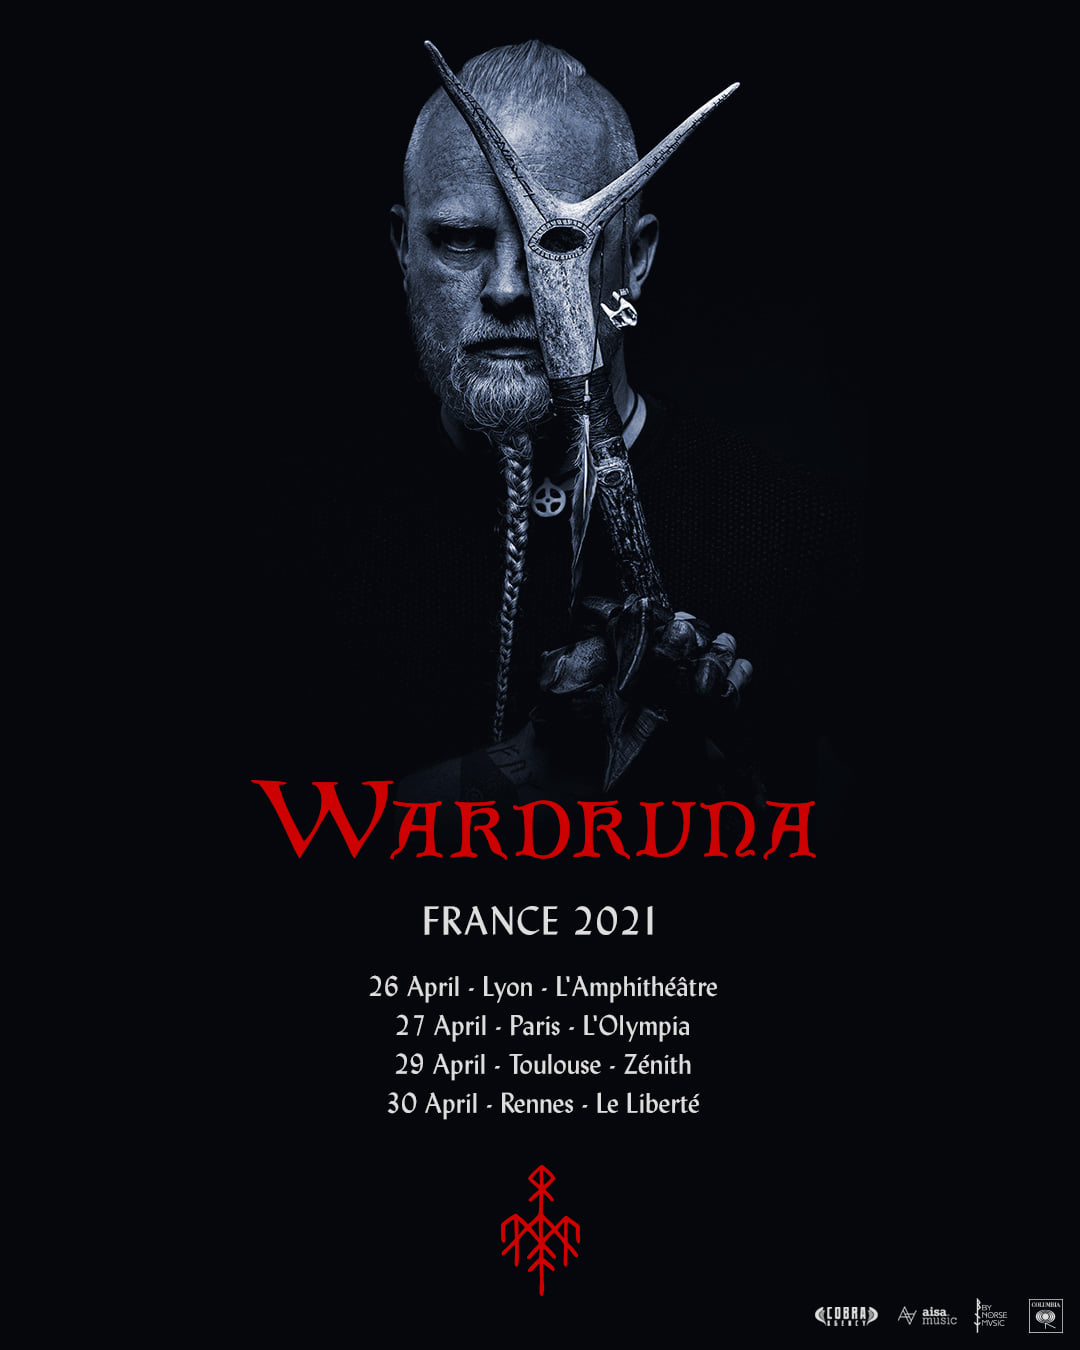 WARDRUNA de passage en France en avril 2021